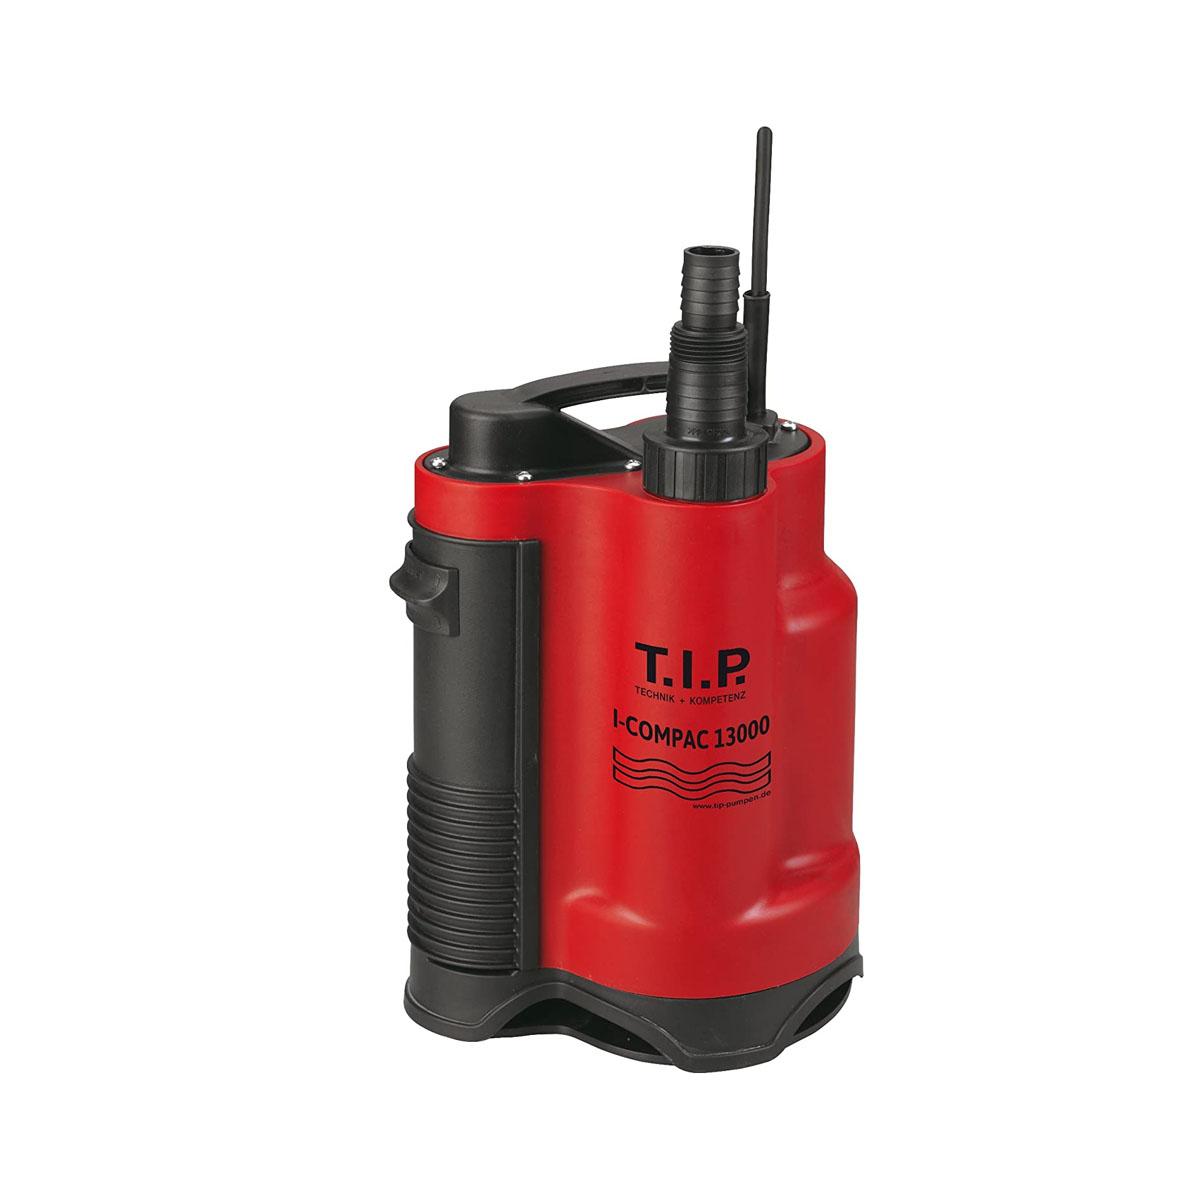 T.I.P. I-COMPAC 13000